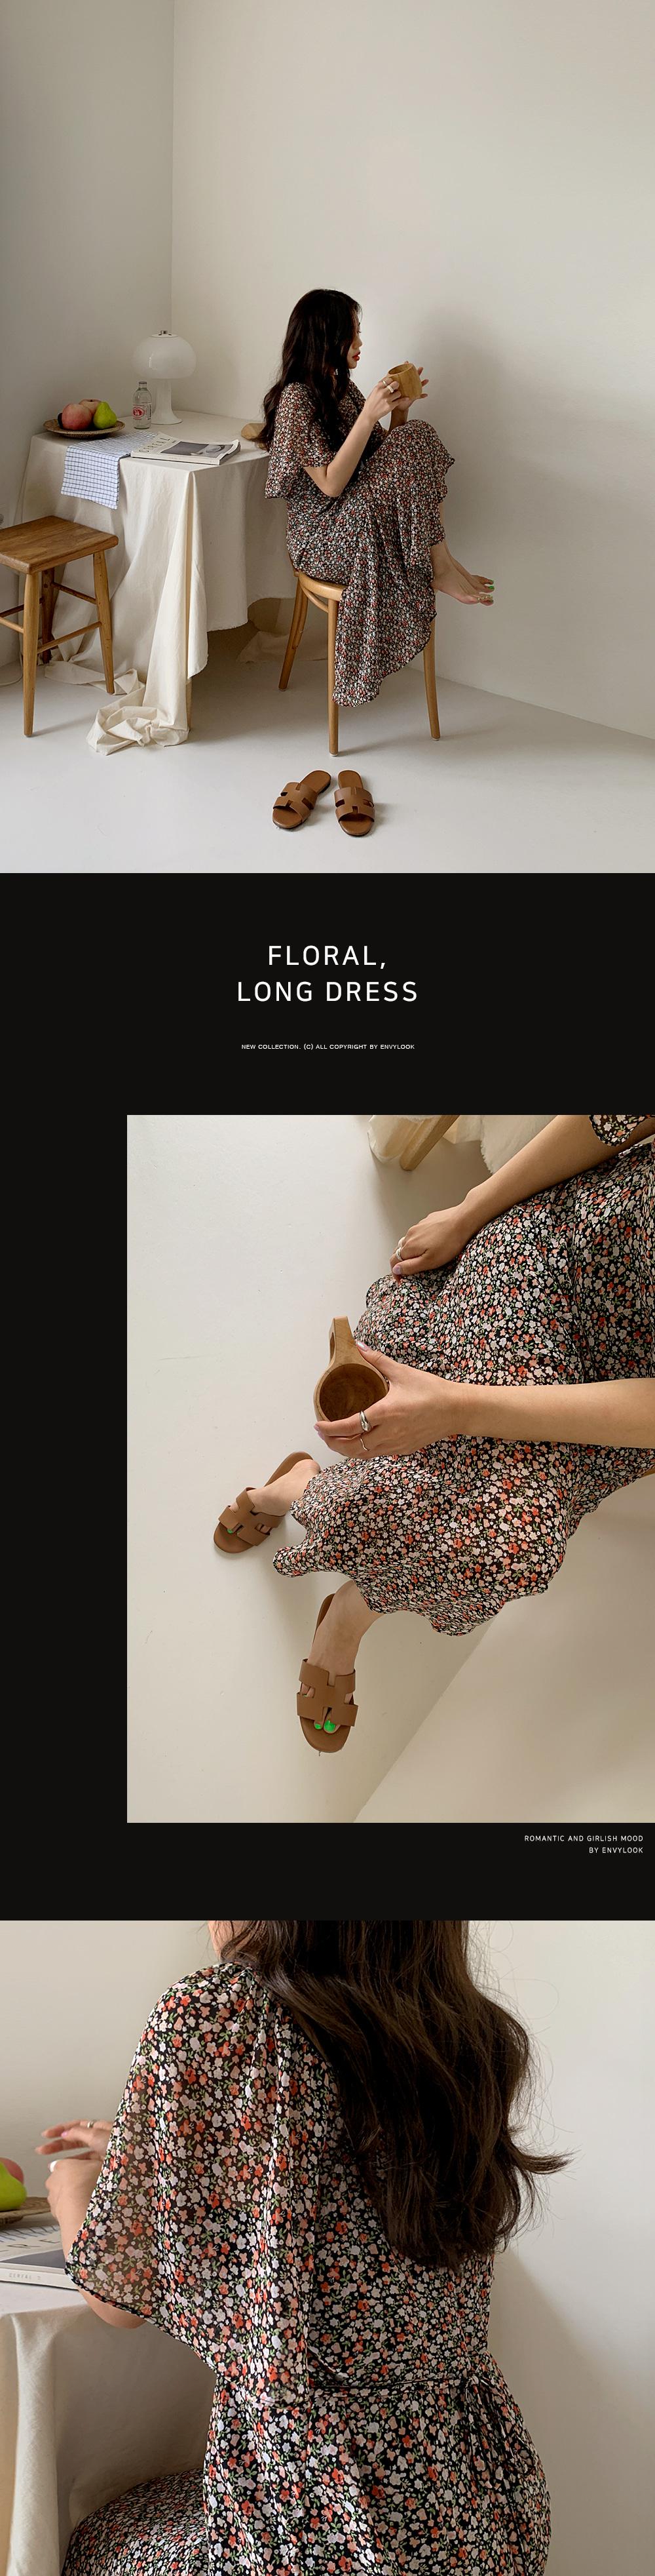 Flower Scent Long Dress